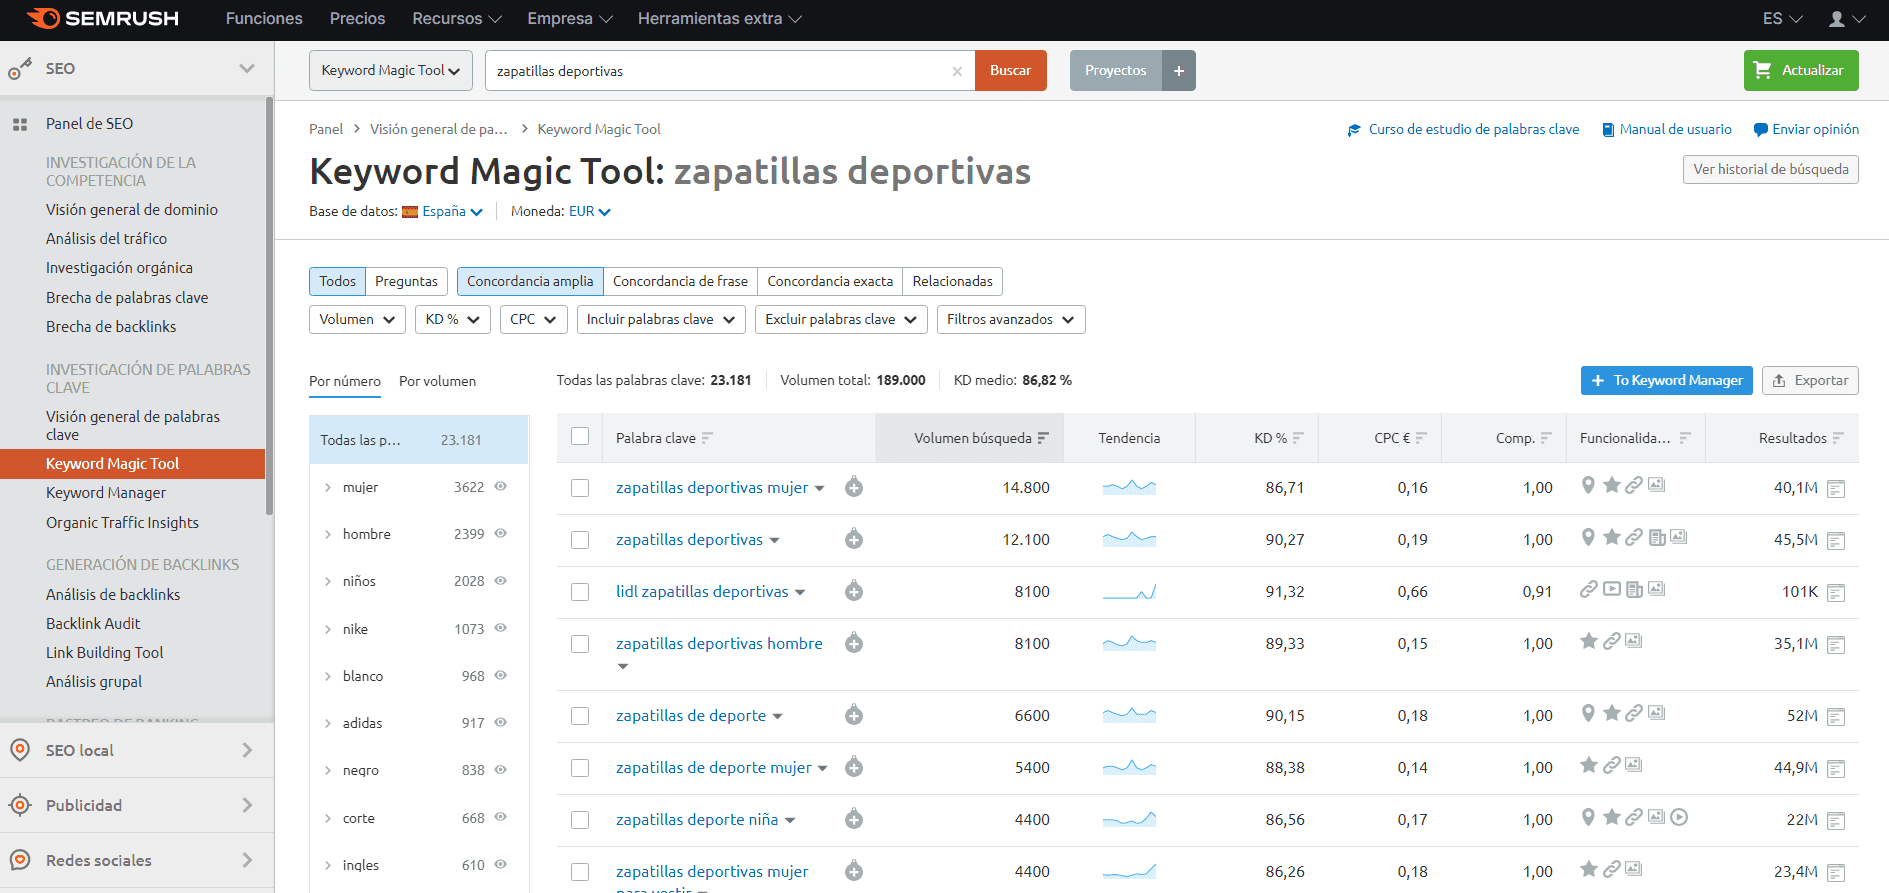 keyword magic tool zapatillas